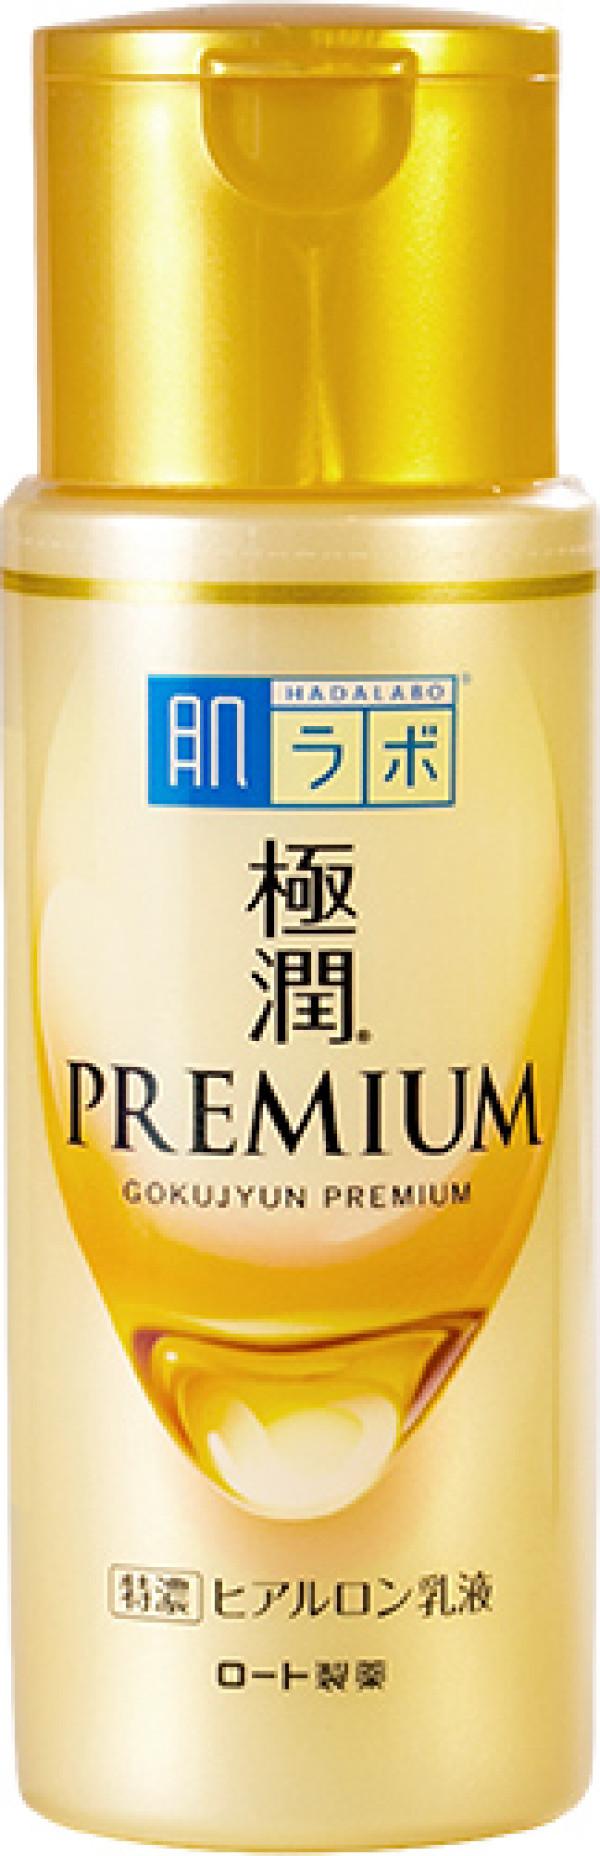 Увлажняющее молочко для лица Hada Labo Gokujyun Premium Hyaluronic Acid Milk